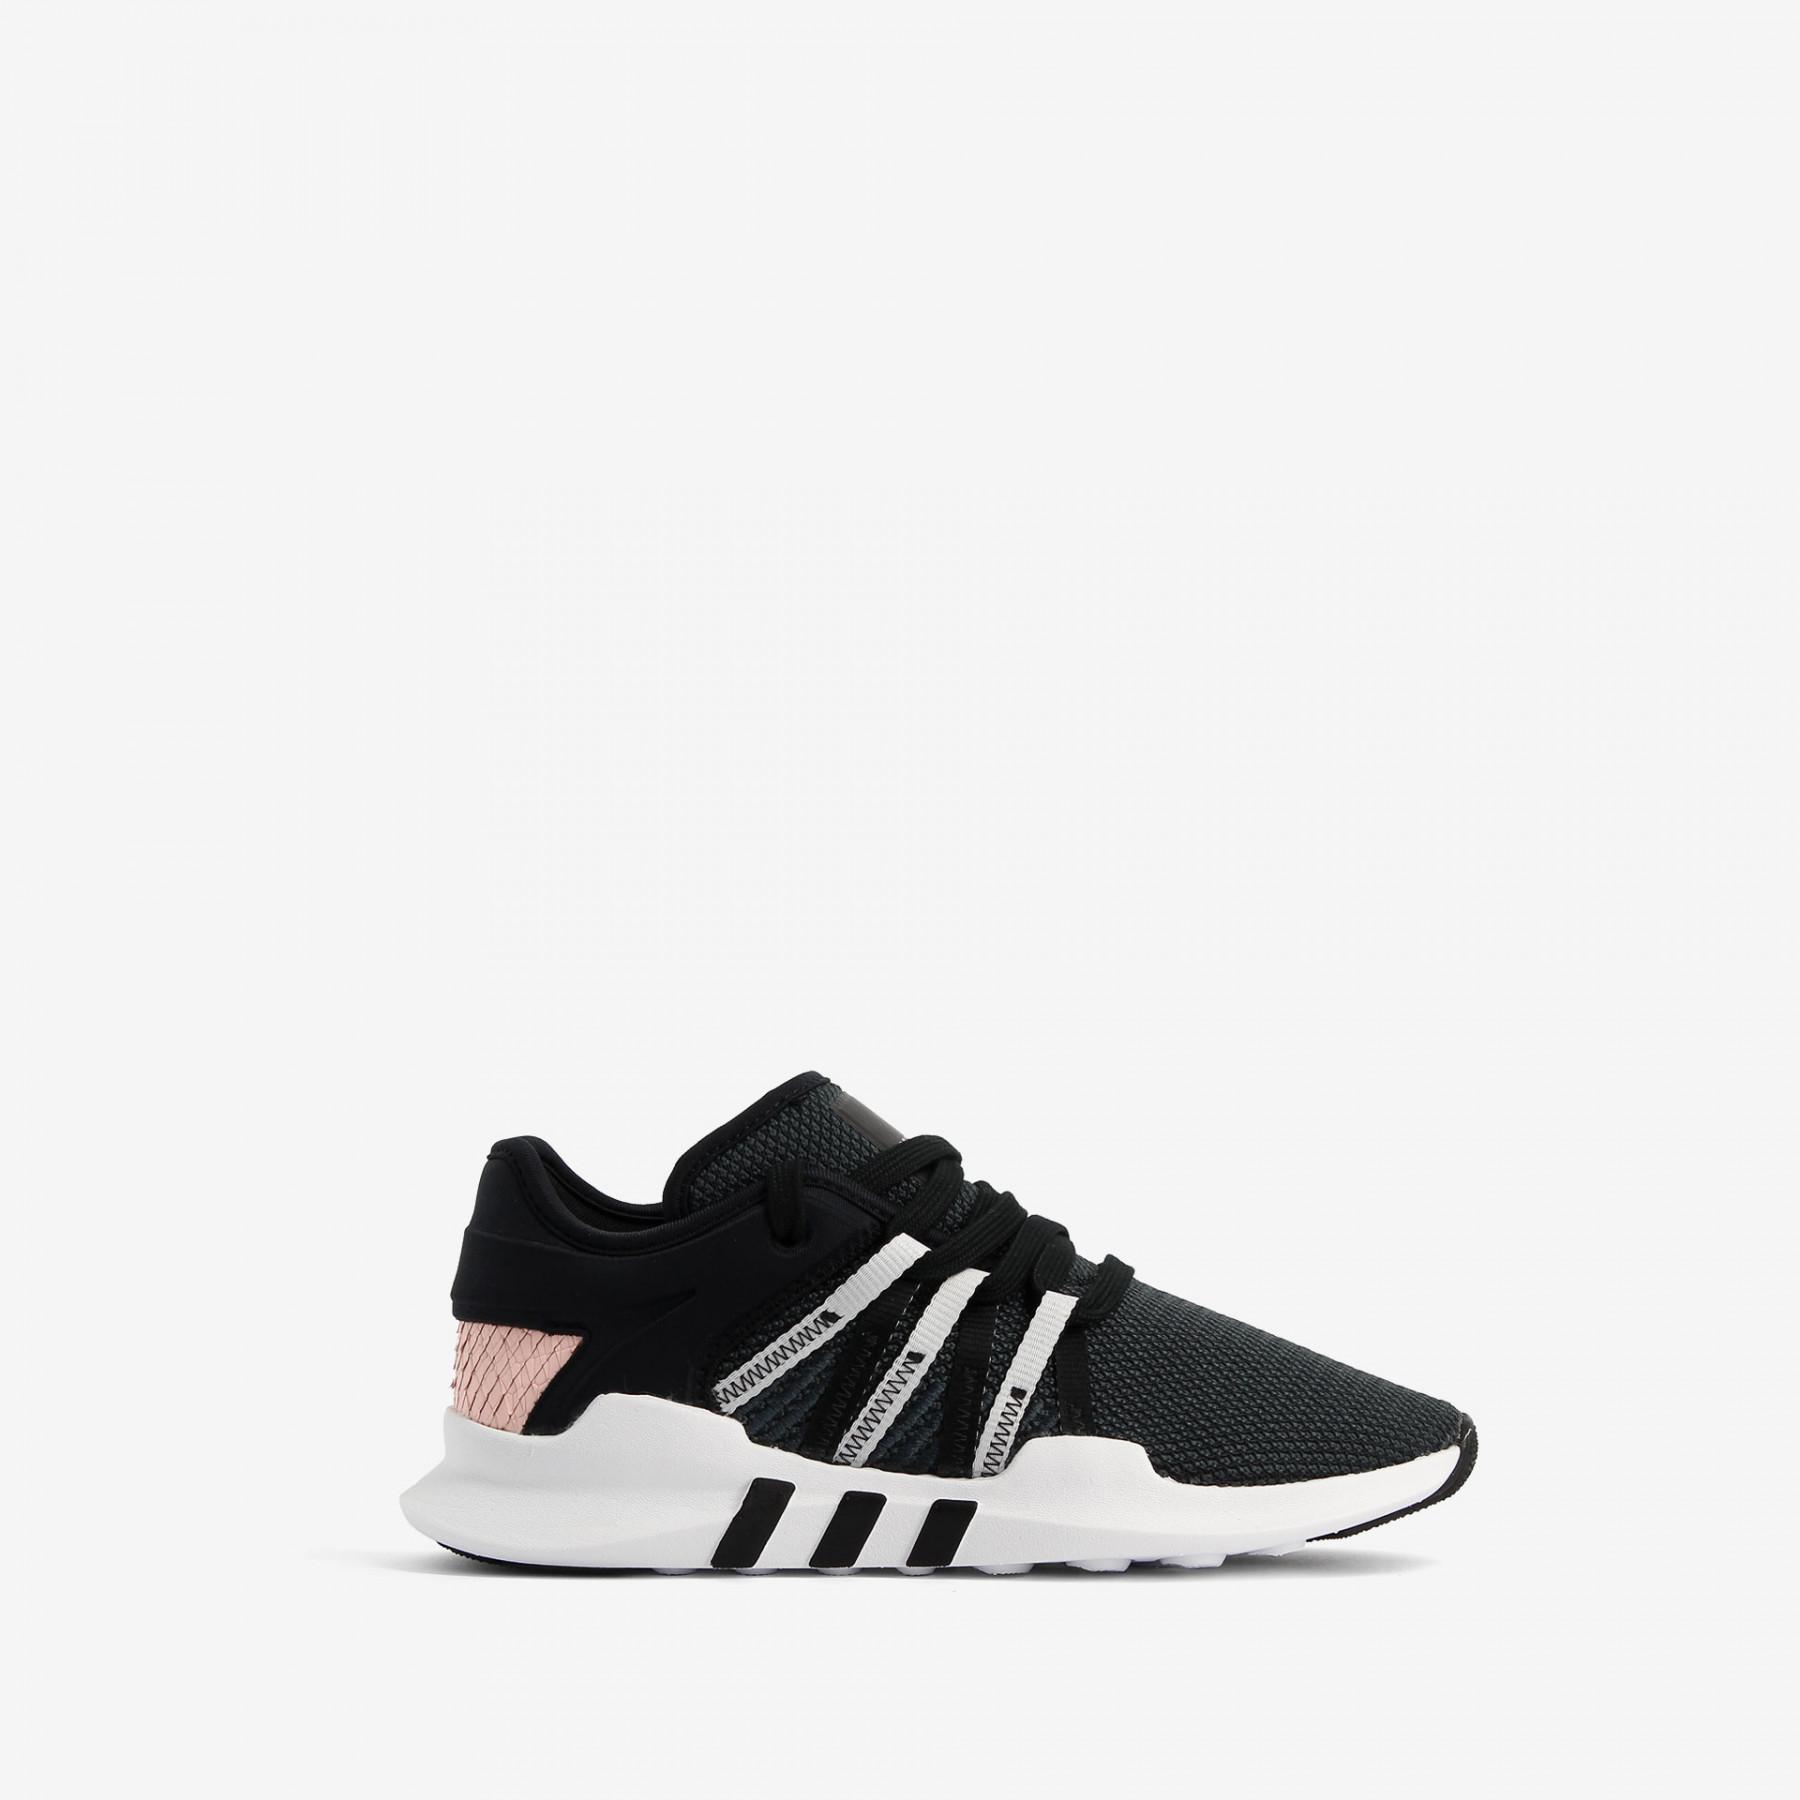 check out 65ce4 fa57e Lyst - adidas Originals Eqt Racing Adv Sneakers in Black for